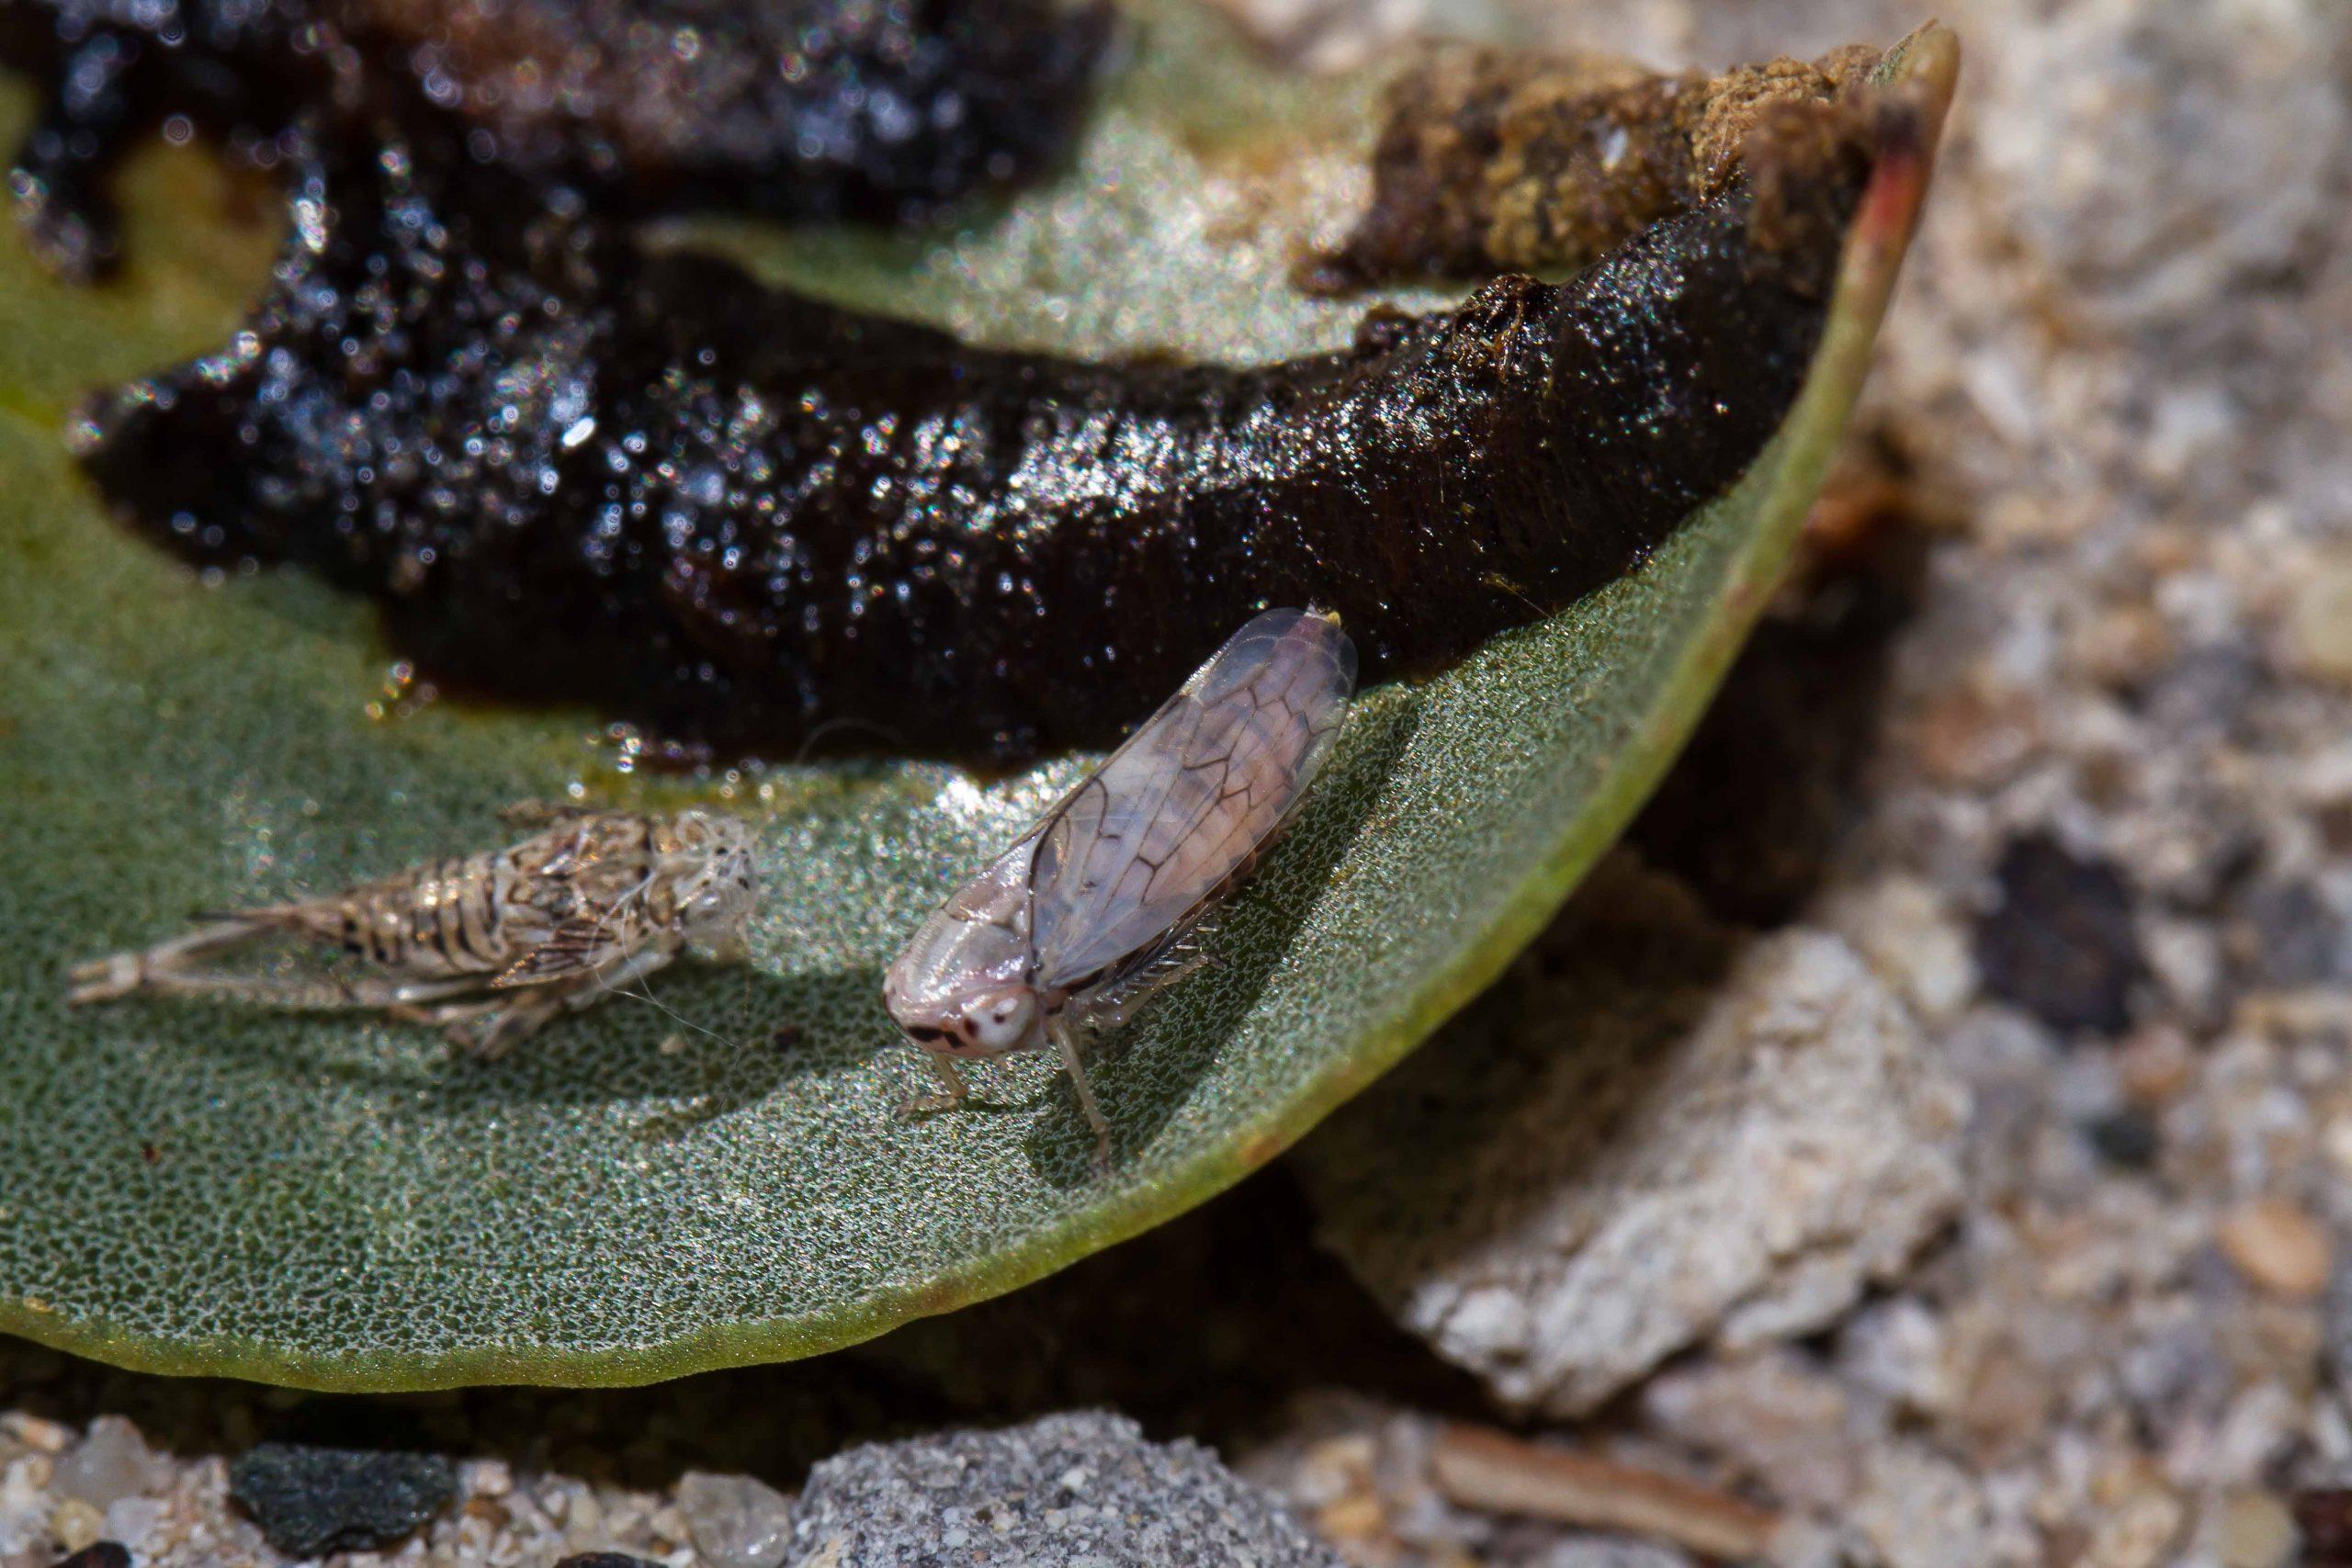 leaf hopper and tube of a Tube Spittlebug